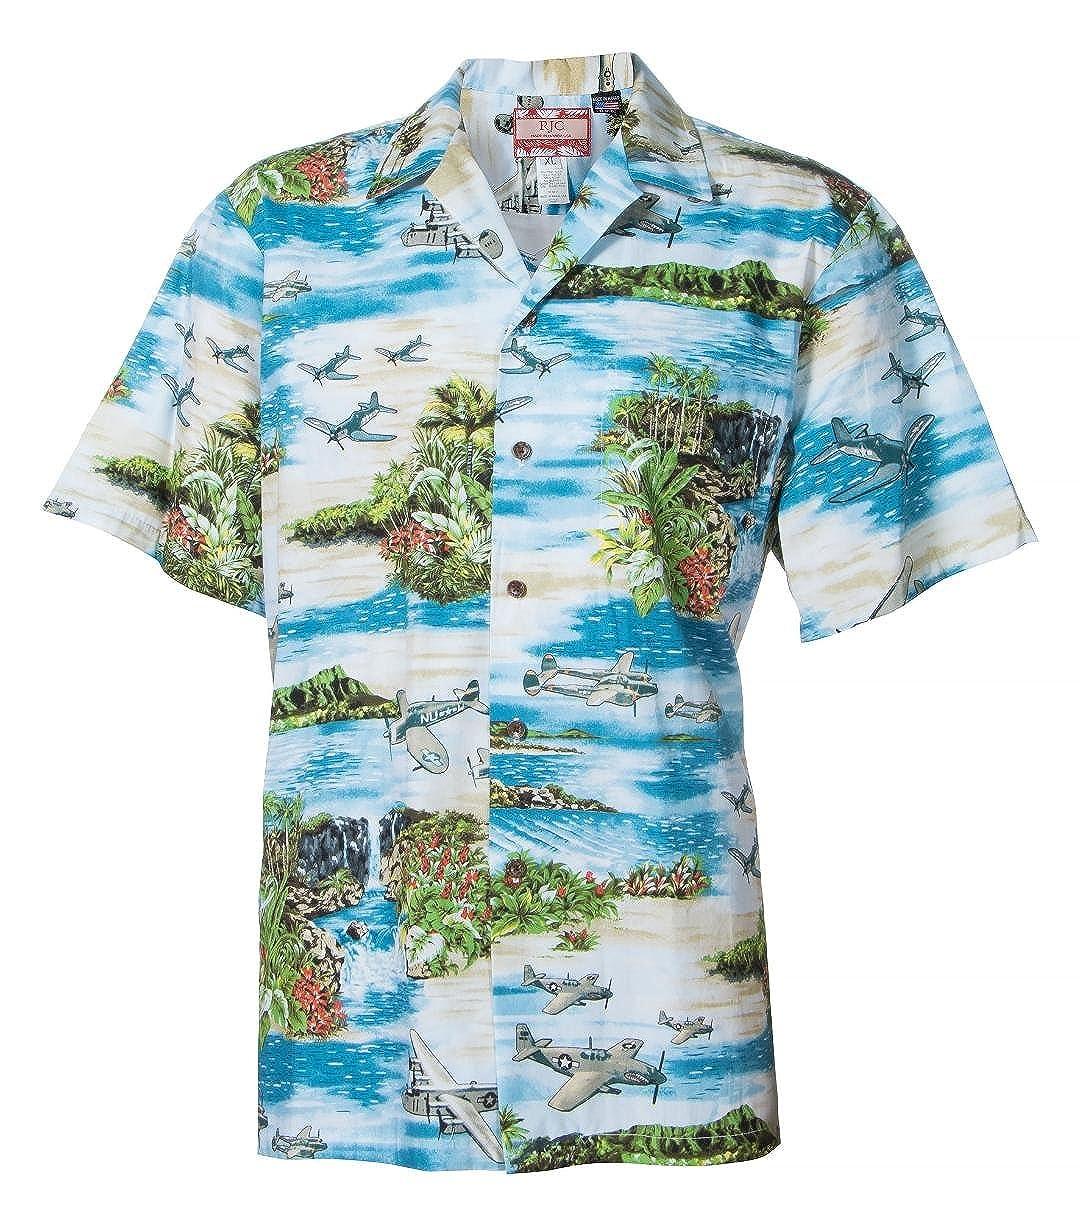 Smiffys Mens Tropical Hawaiian Luau Shirt Summer Holiday Stag Party Fancy Dress